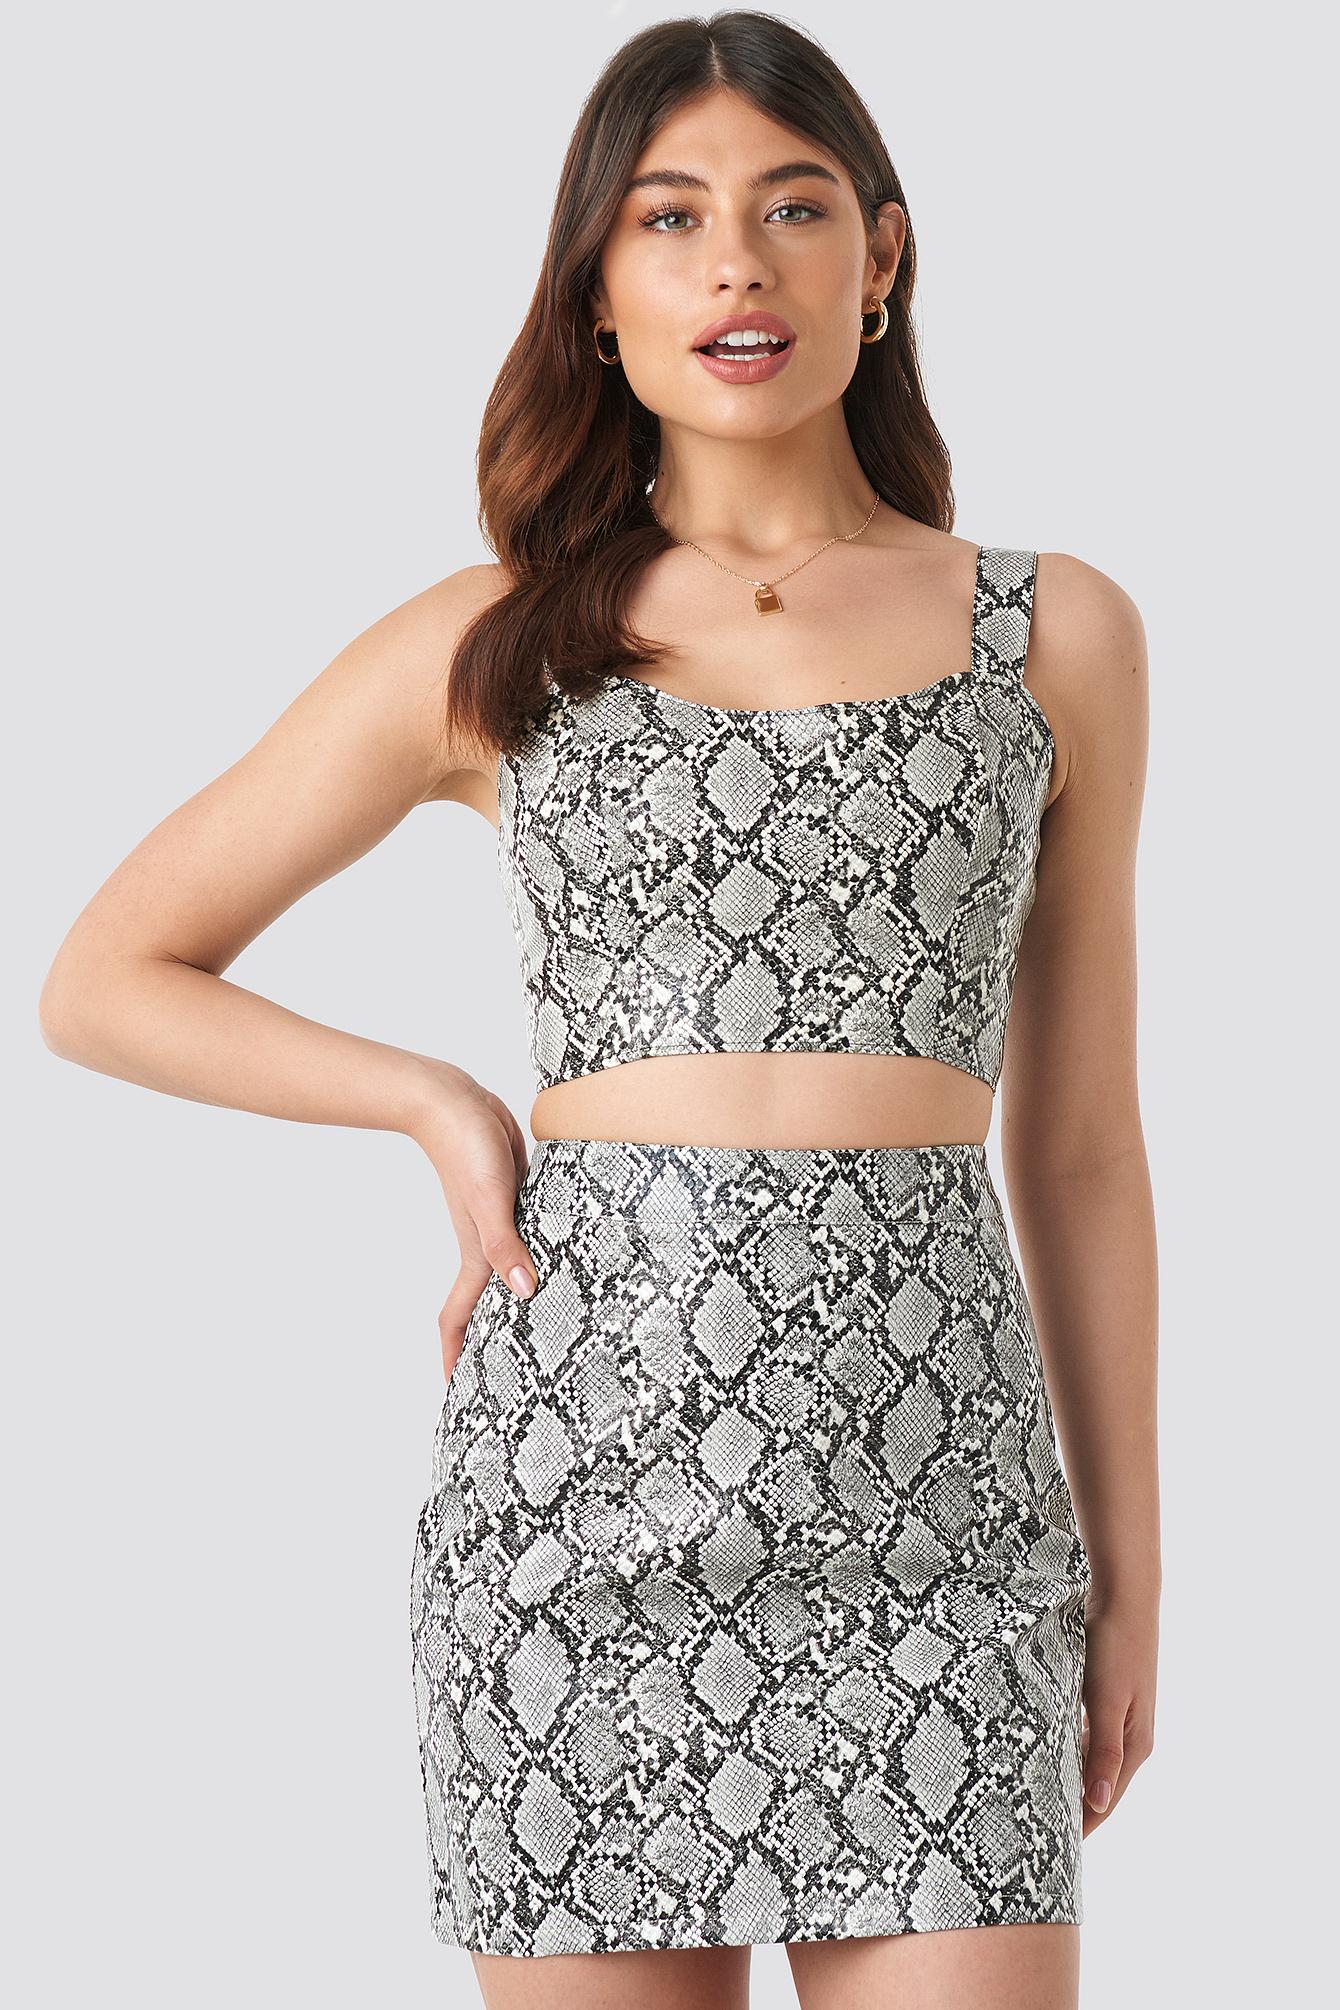 Snake Printed PU Mini Skirt NA-KD.COM